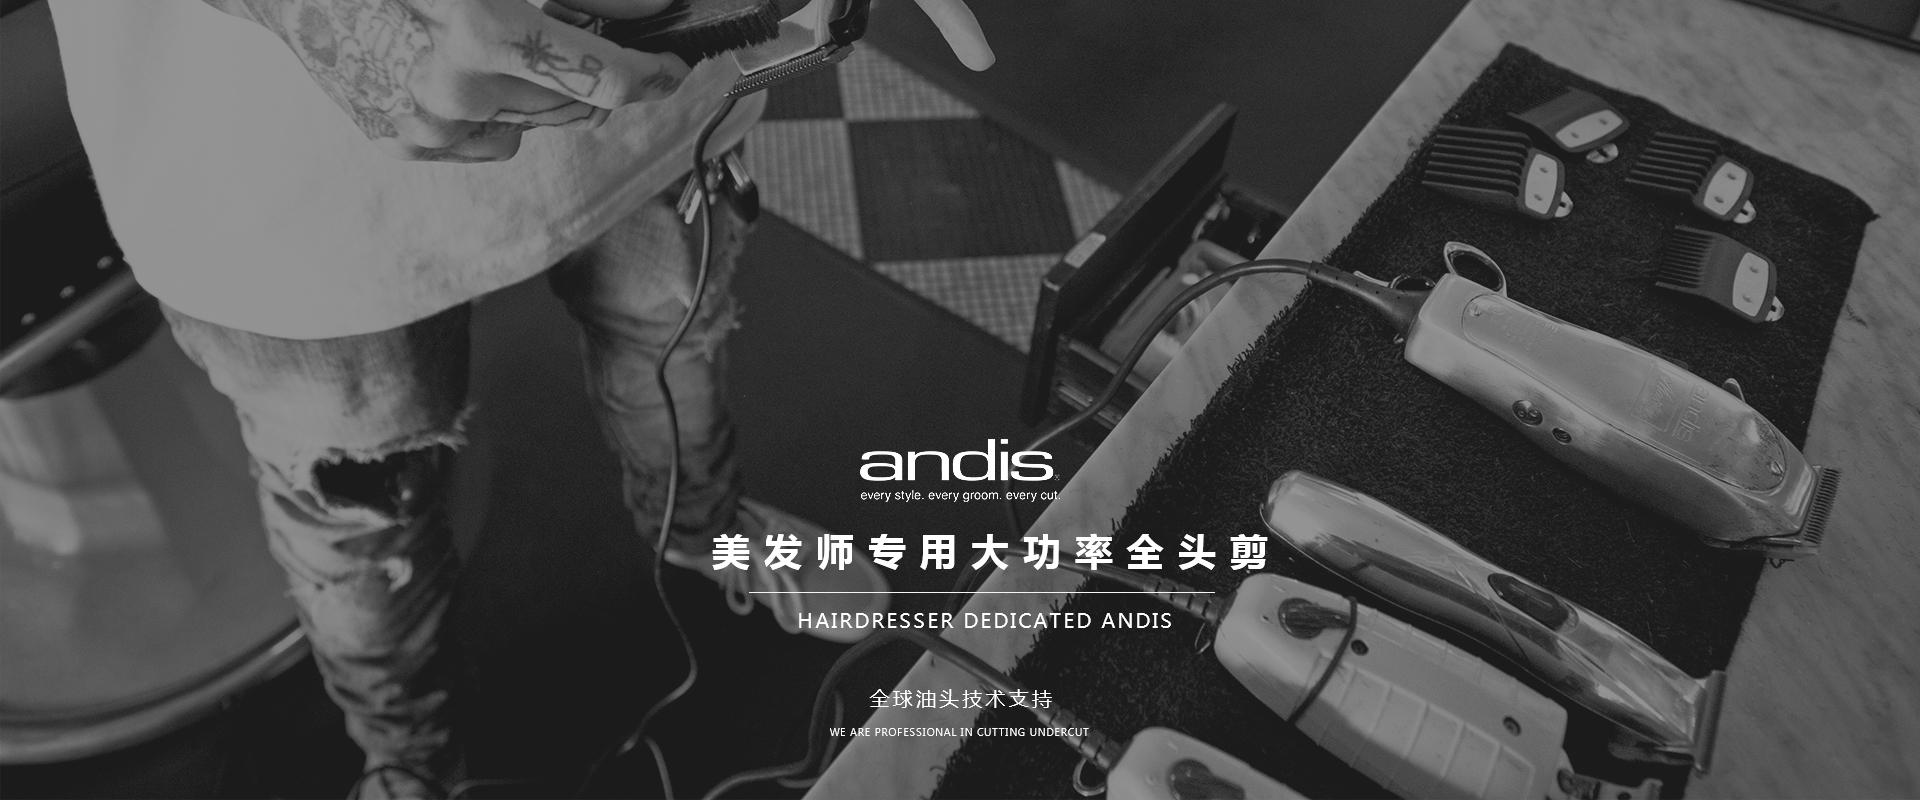 Andis电推剪代理加盟